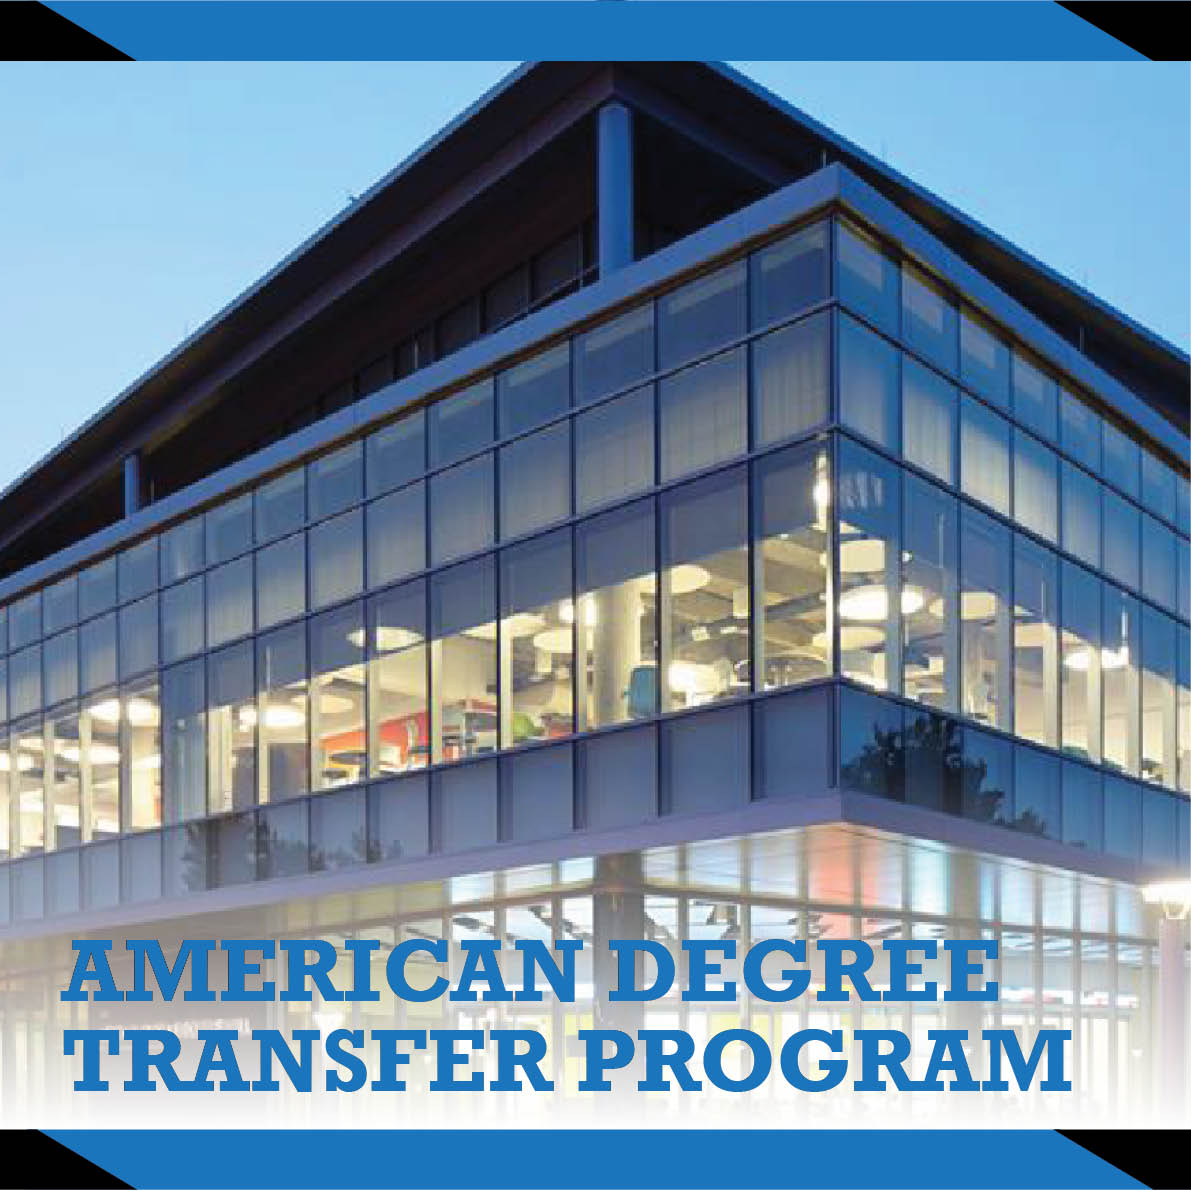 UMKC American Degree Transfer Program | TMC Academy